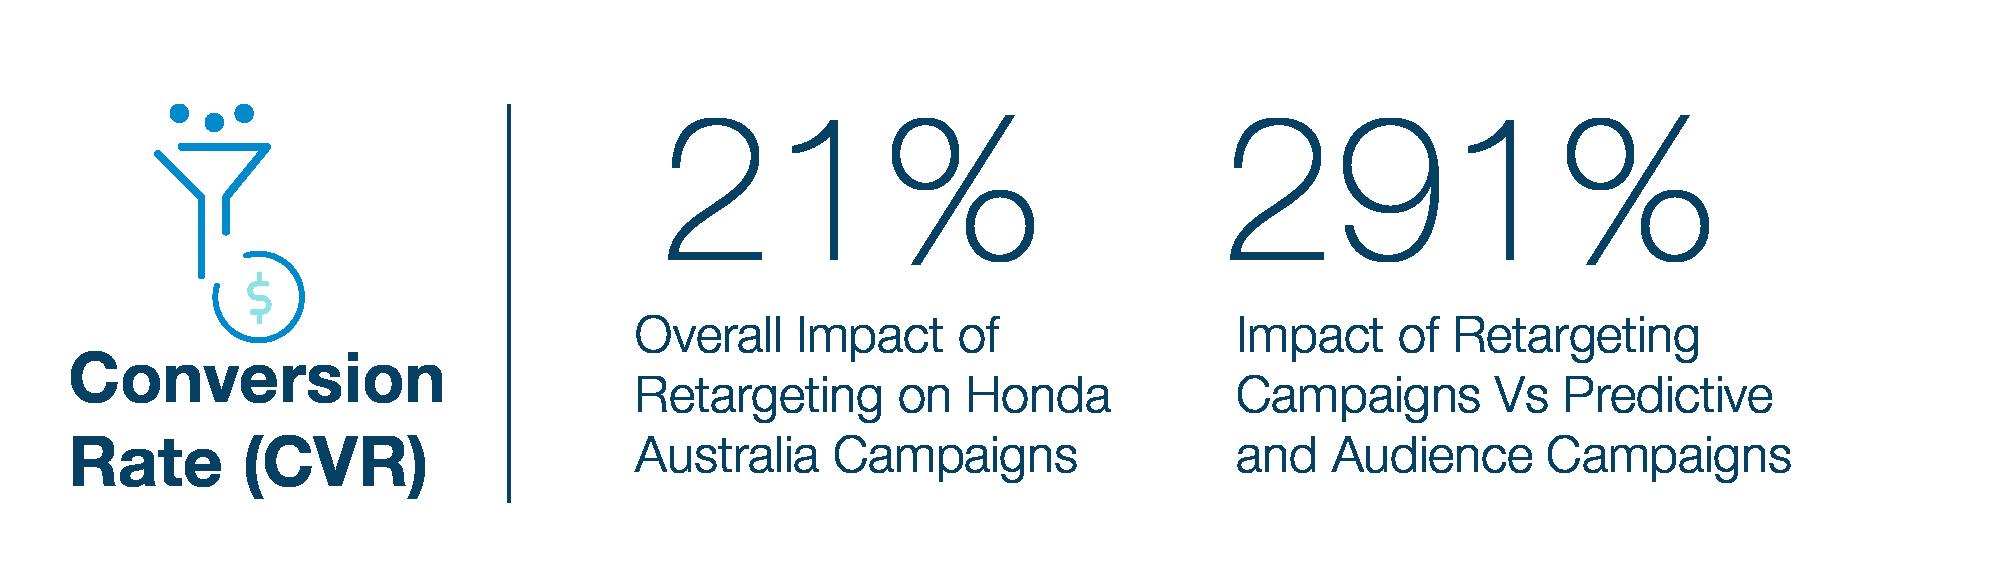 HONDA AUSTRALIA、TABOOLAリターゲティグに よりコンバージョン率が291%増加